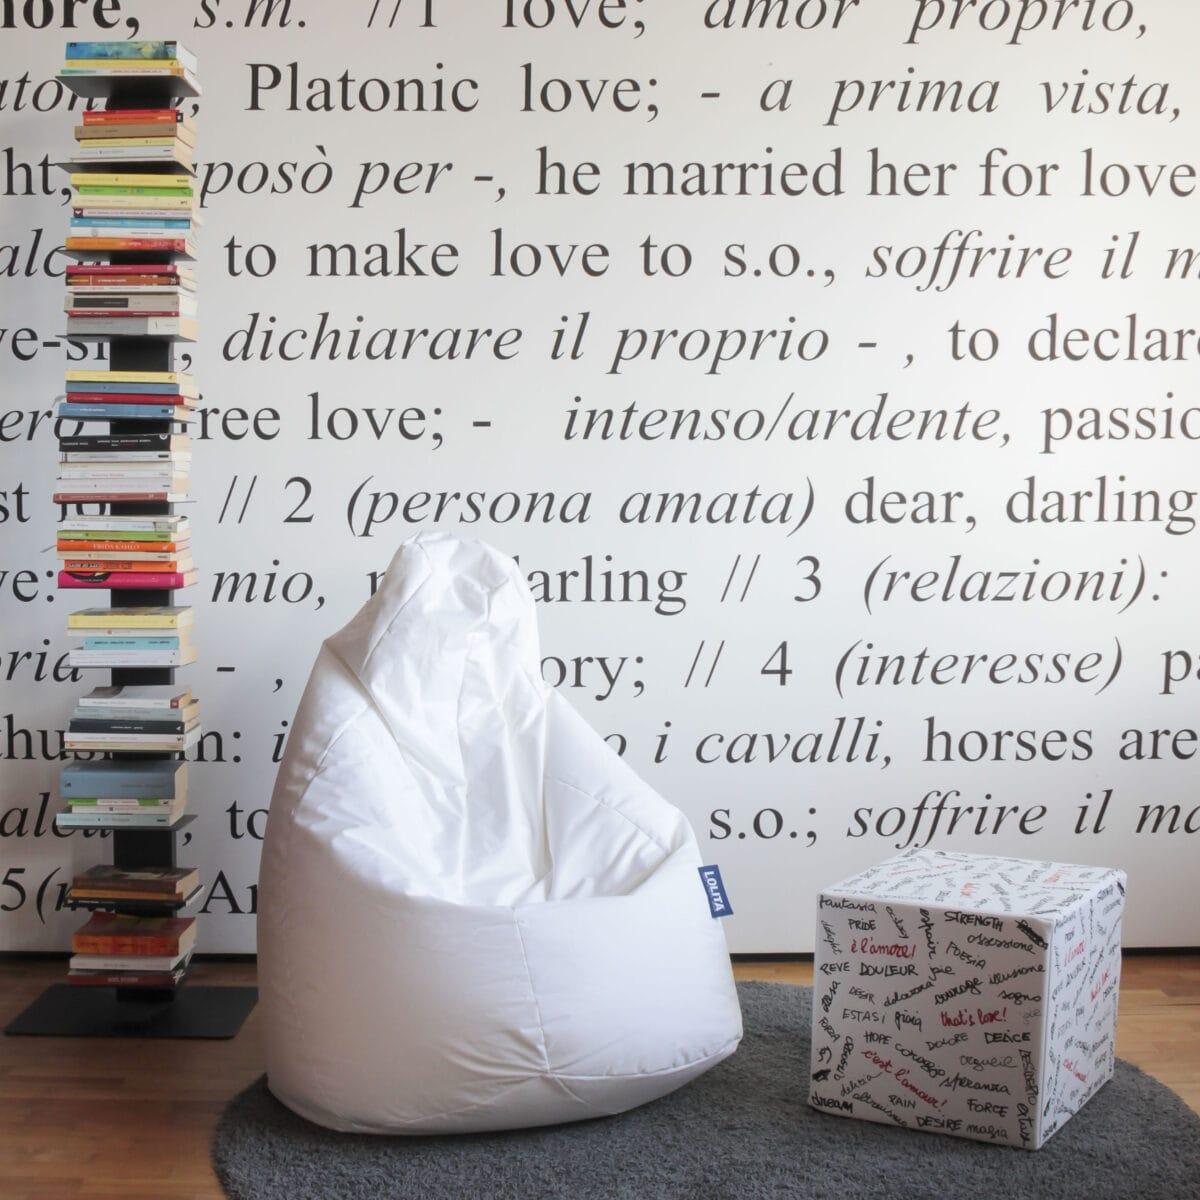 una poltrona a sacco bianco è affiancata da un pouff a cubo con scritte su tutti i lati